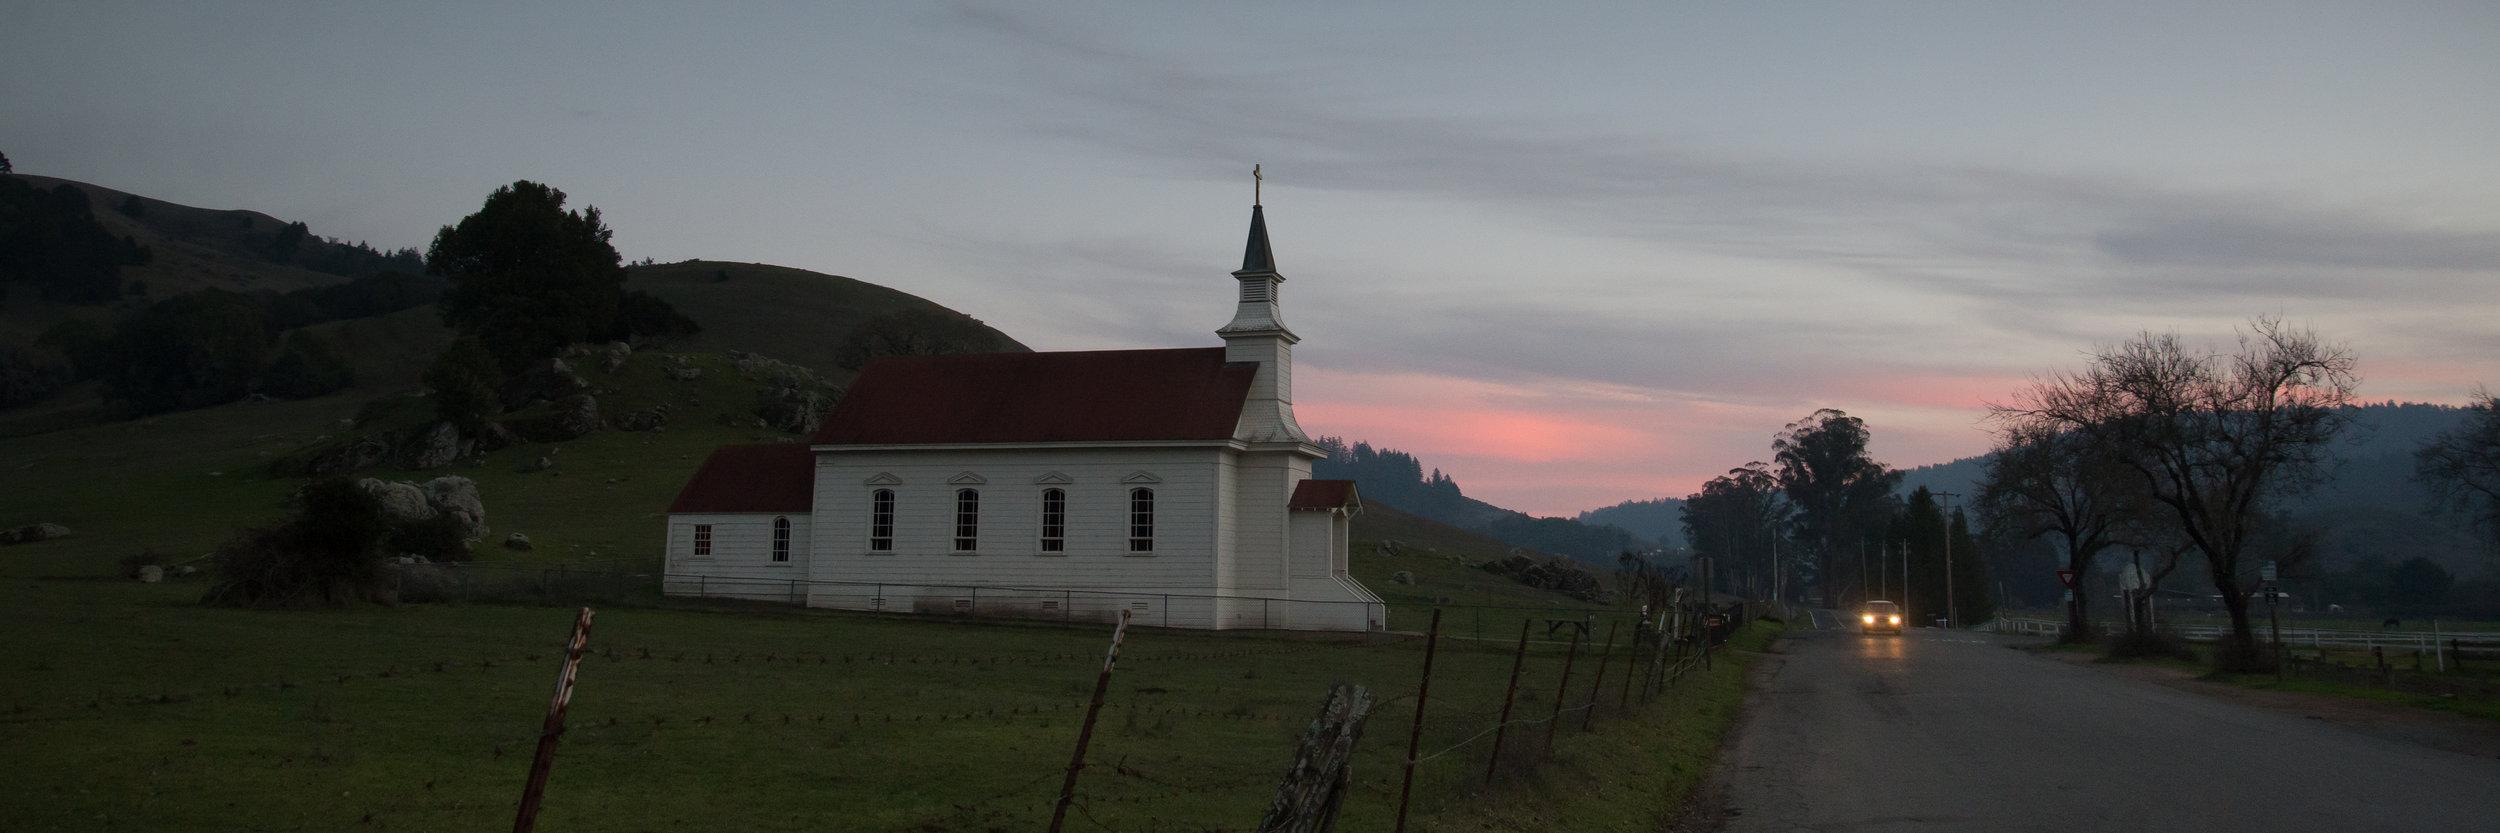 Nicasio-Church-evening-letterbox-2-5227.jpg